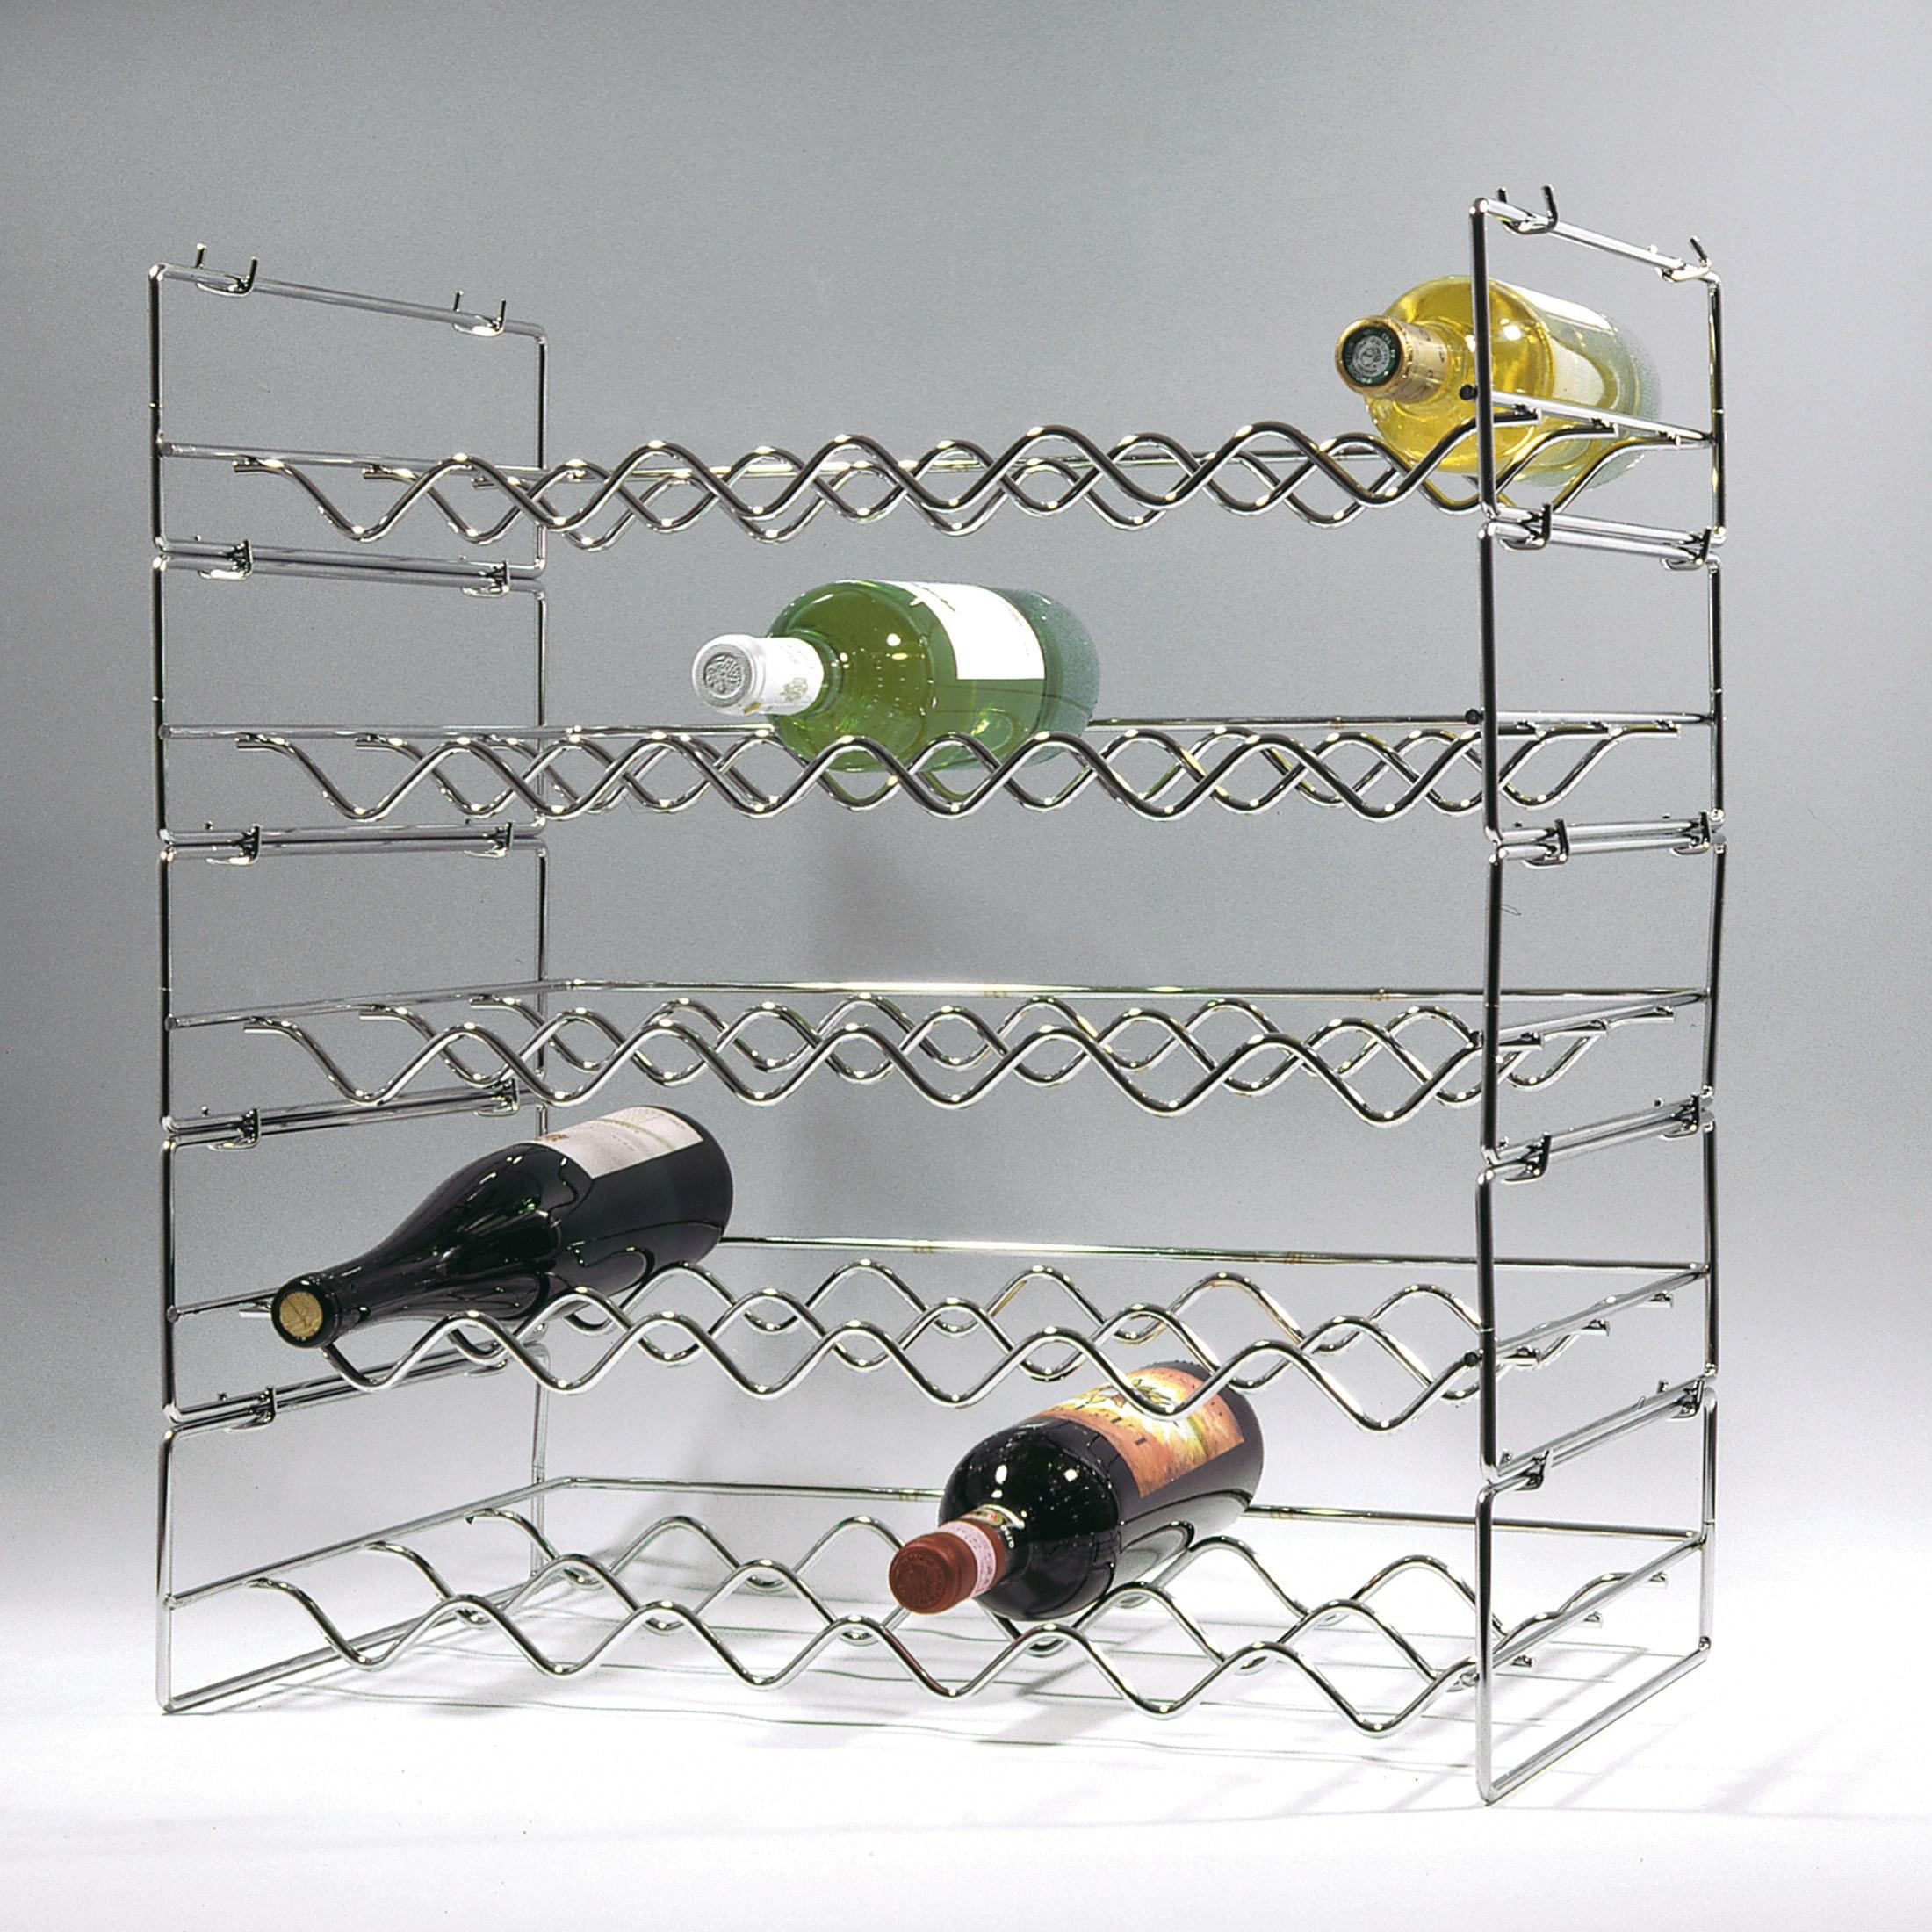 weinregal flaschenregal system loop metall stahl verchromt stapelbar erwei ebay. Black Bedroom Furniture Sets. Home Design Ideas